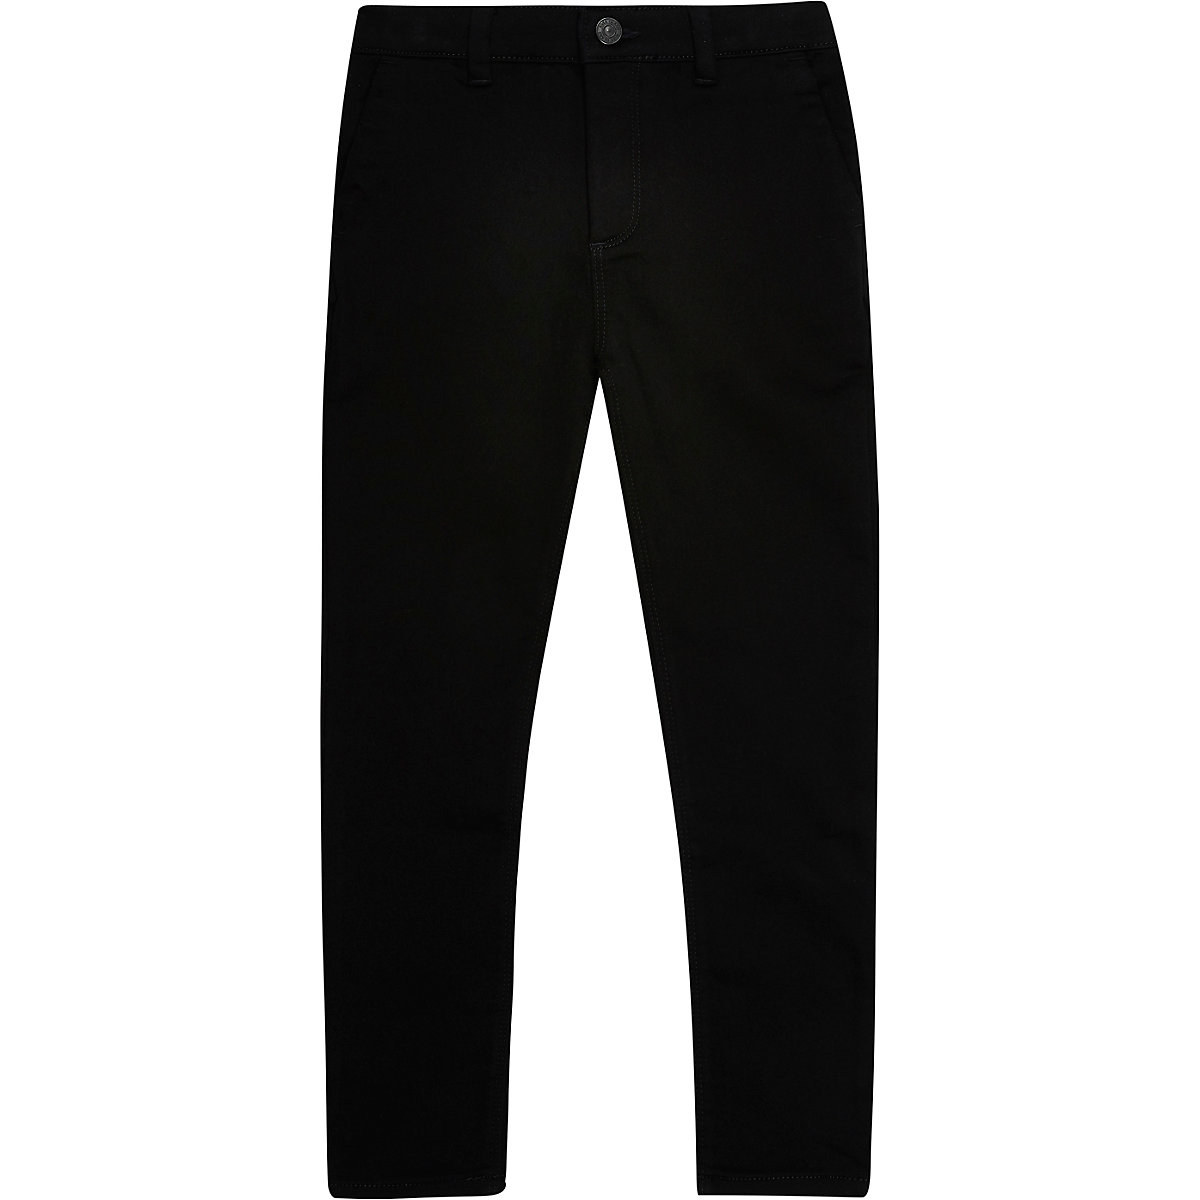 Boys black stretch skinny trousers